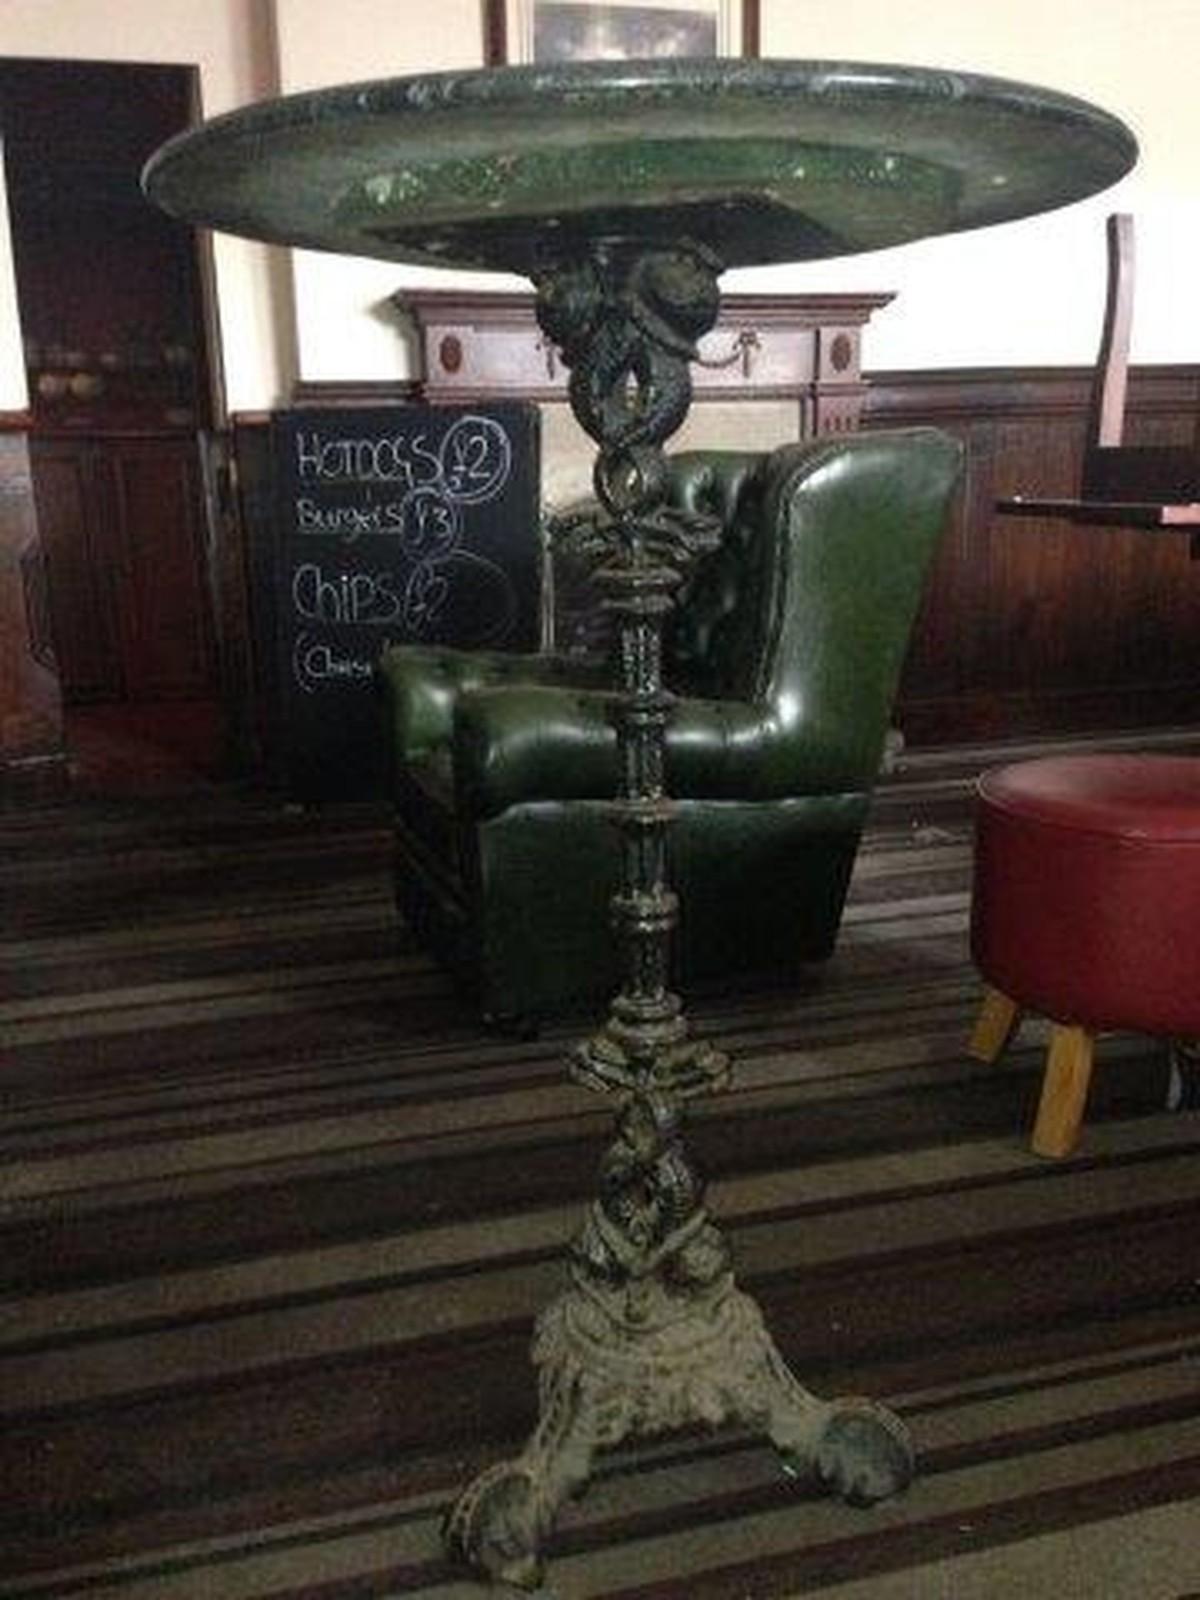 Secondhand pub equipment tables round vintage